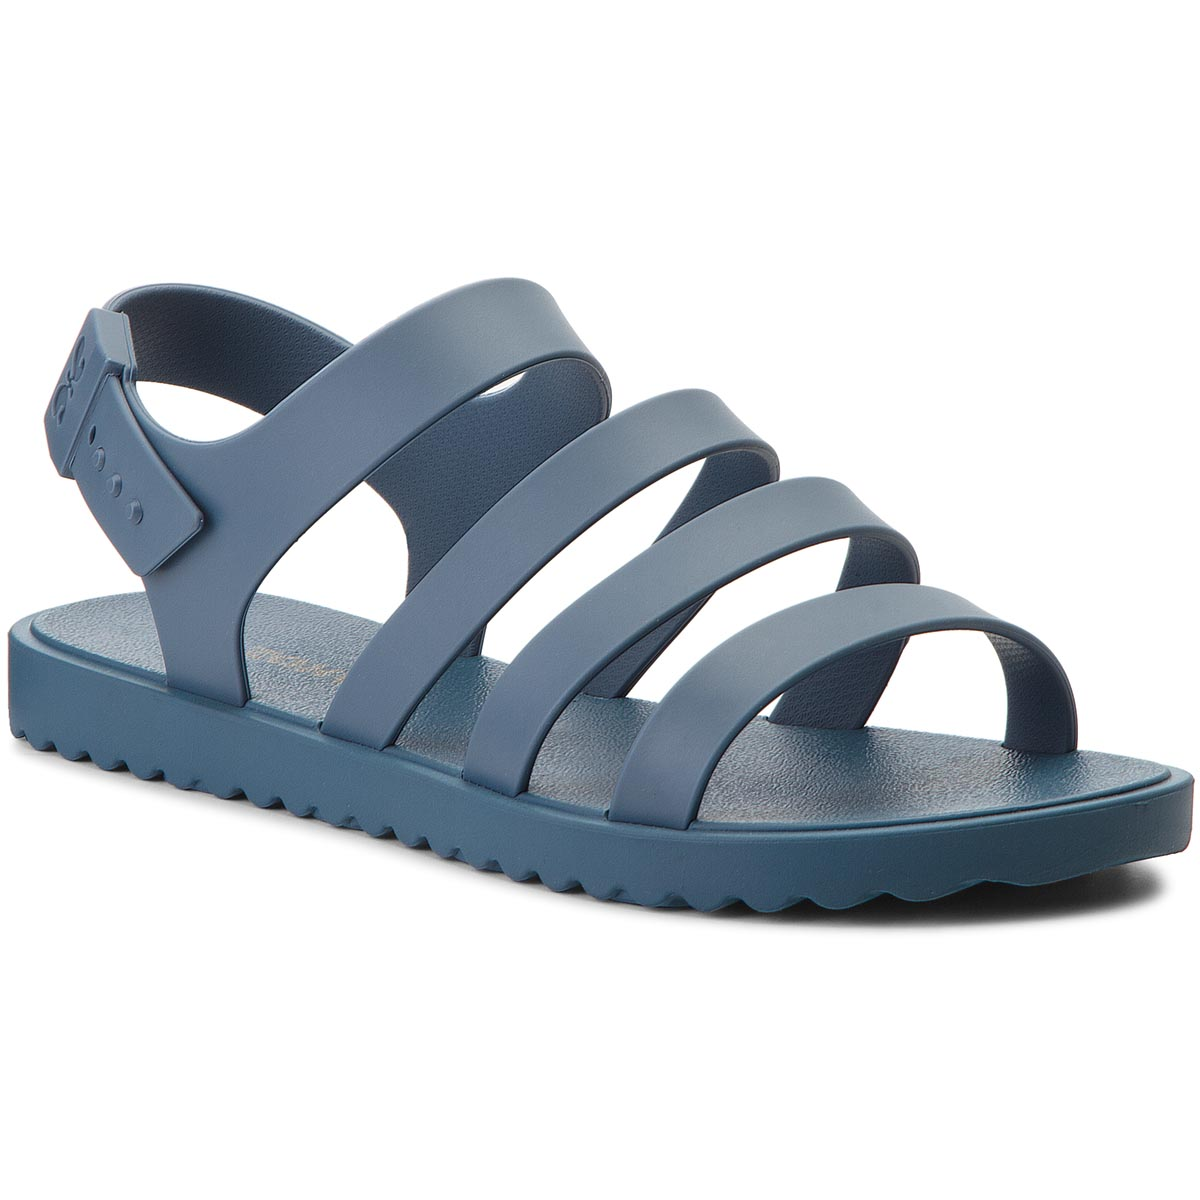 295c2ca1552d Zaxy Spring Sandal Fem 82349 - Glami.cz